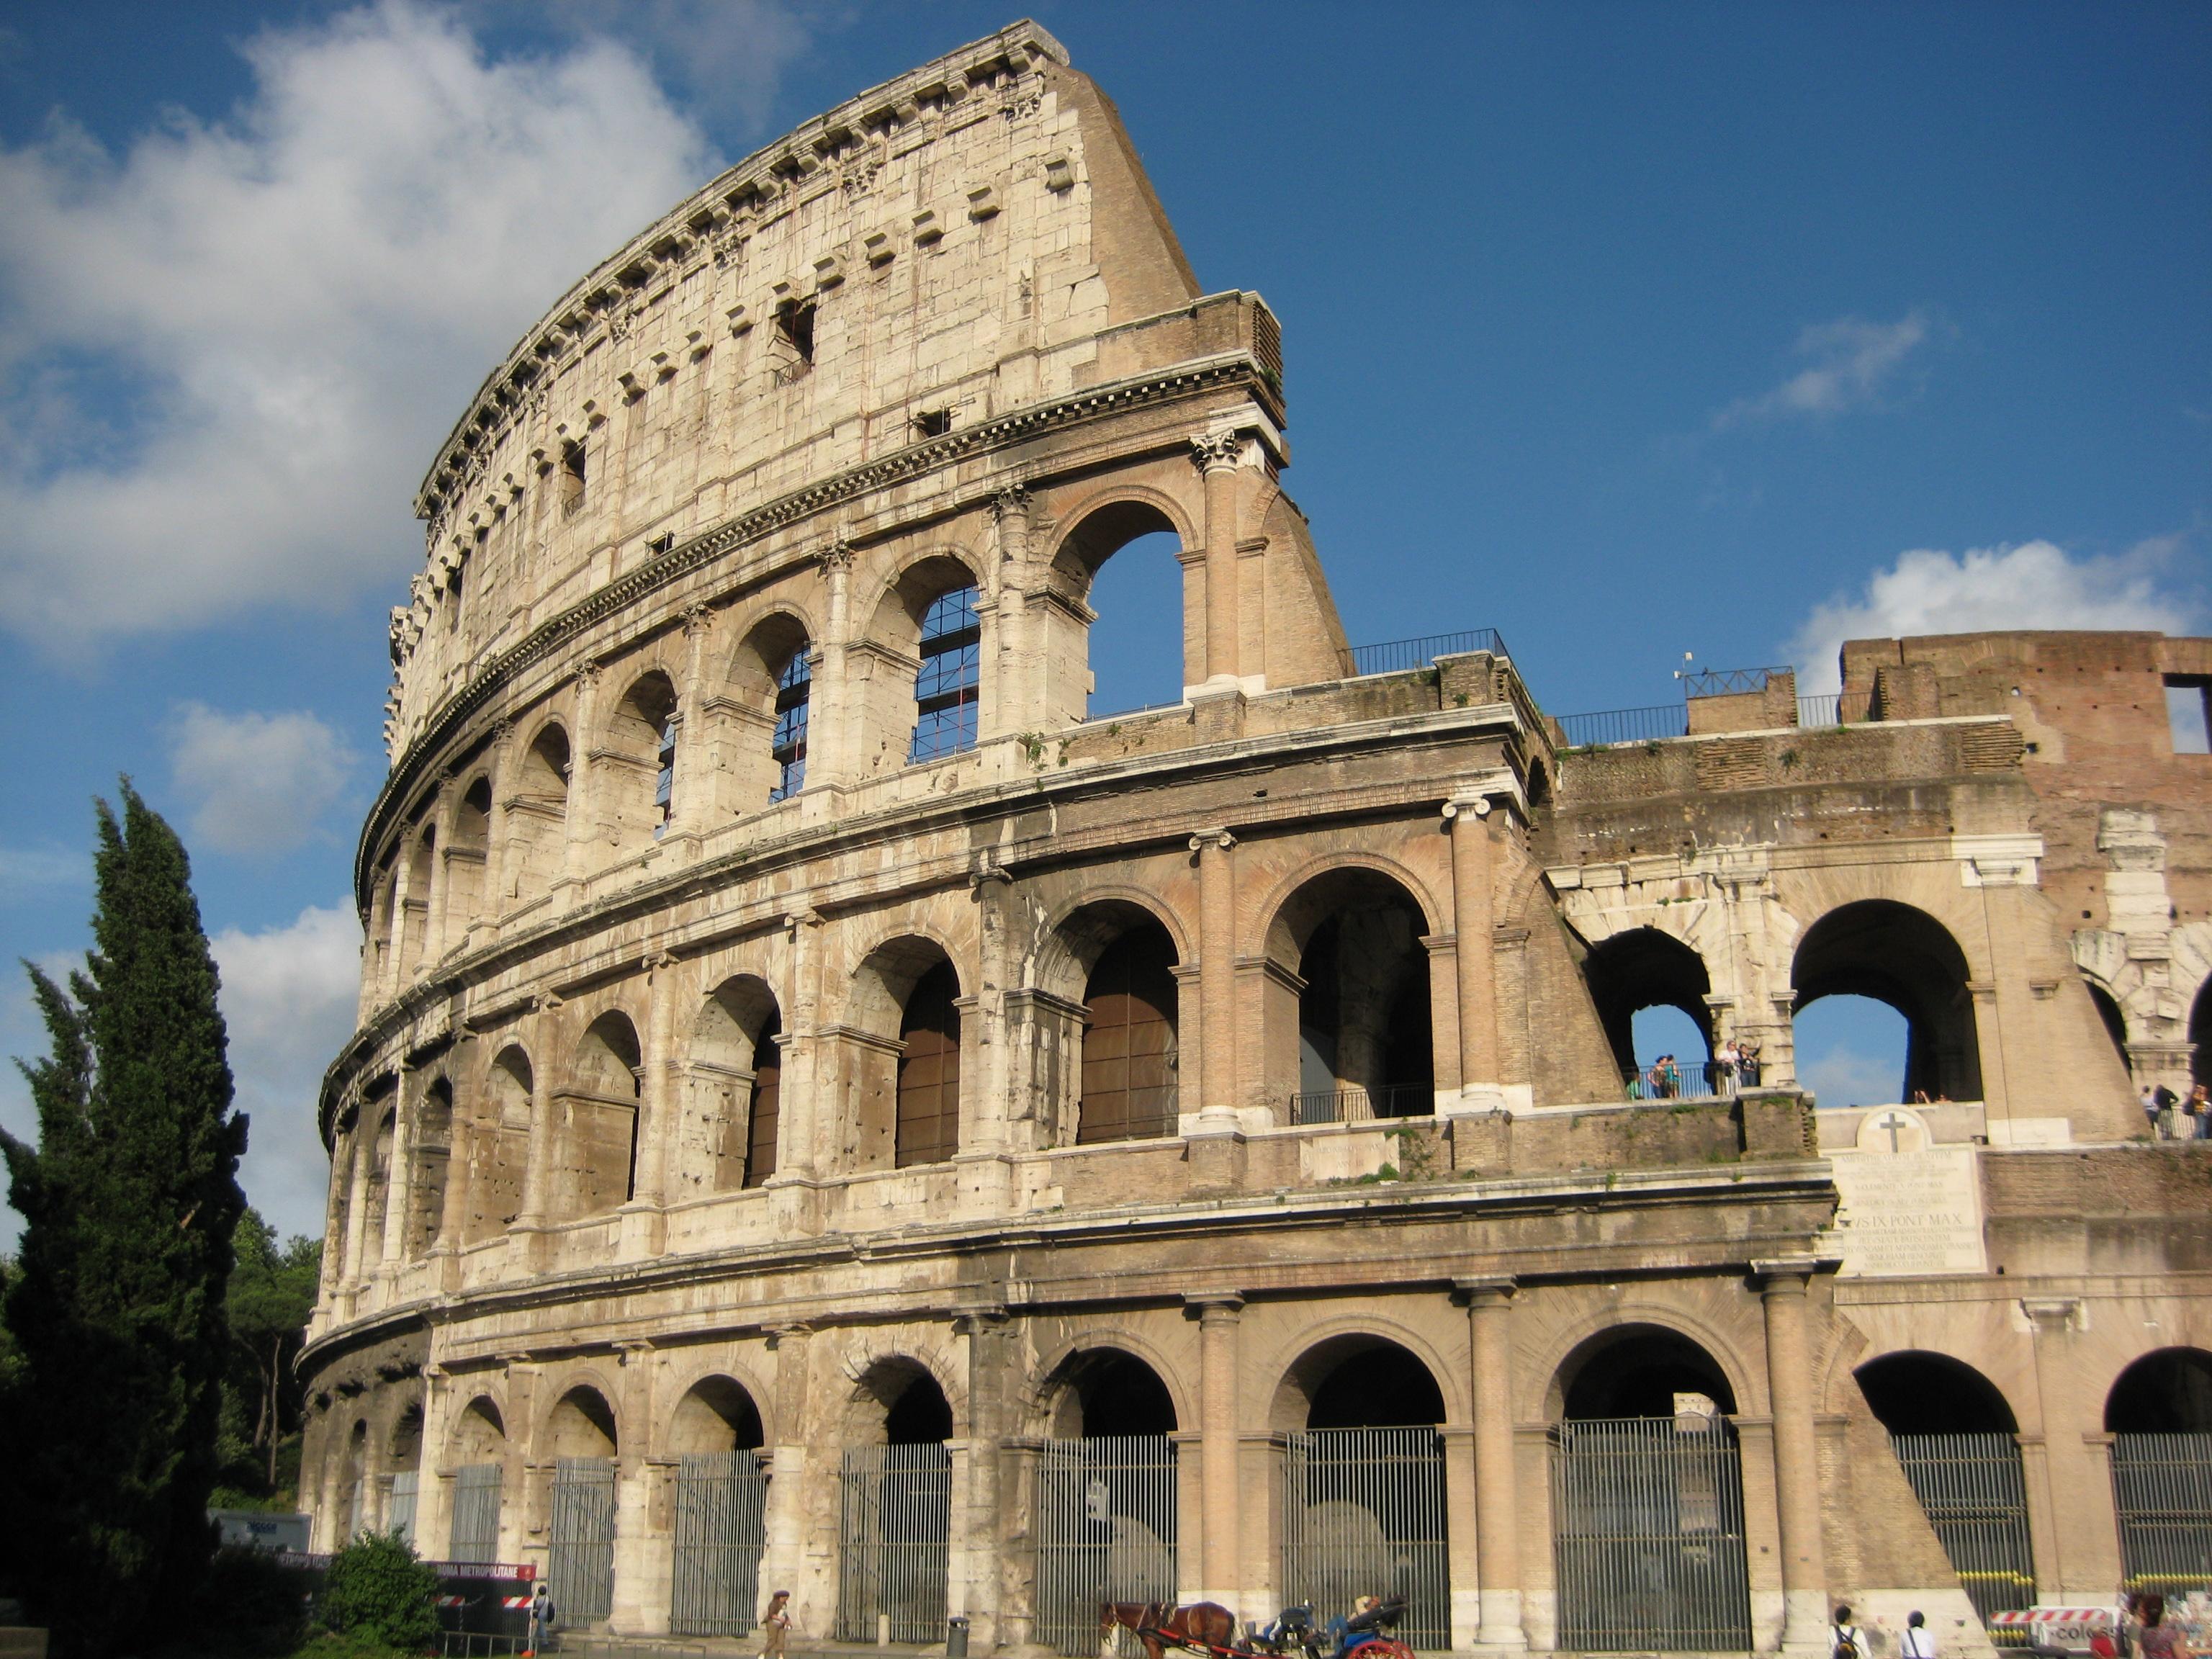 http://upload.wikimedia.org/wikipedia/commons/8/89/Colosseum,_Rome,_wts.jpg